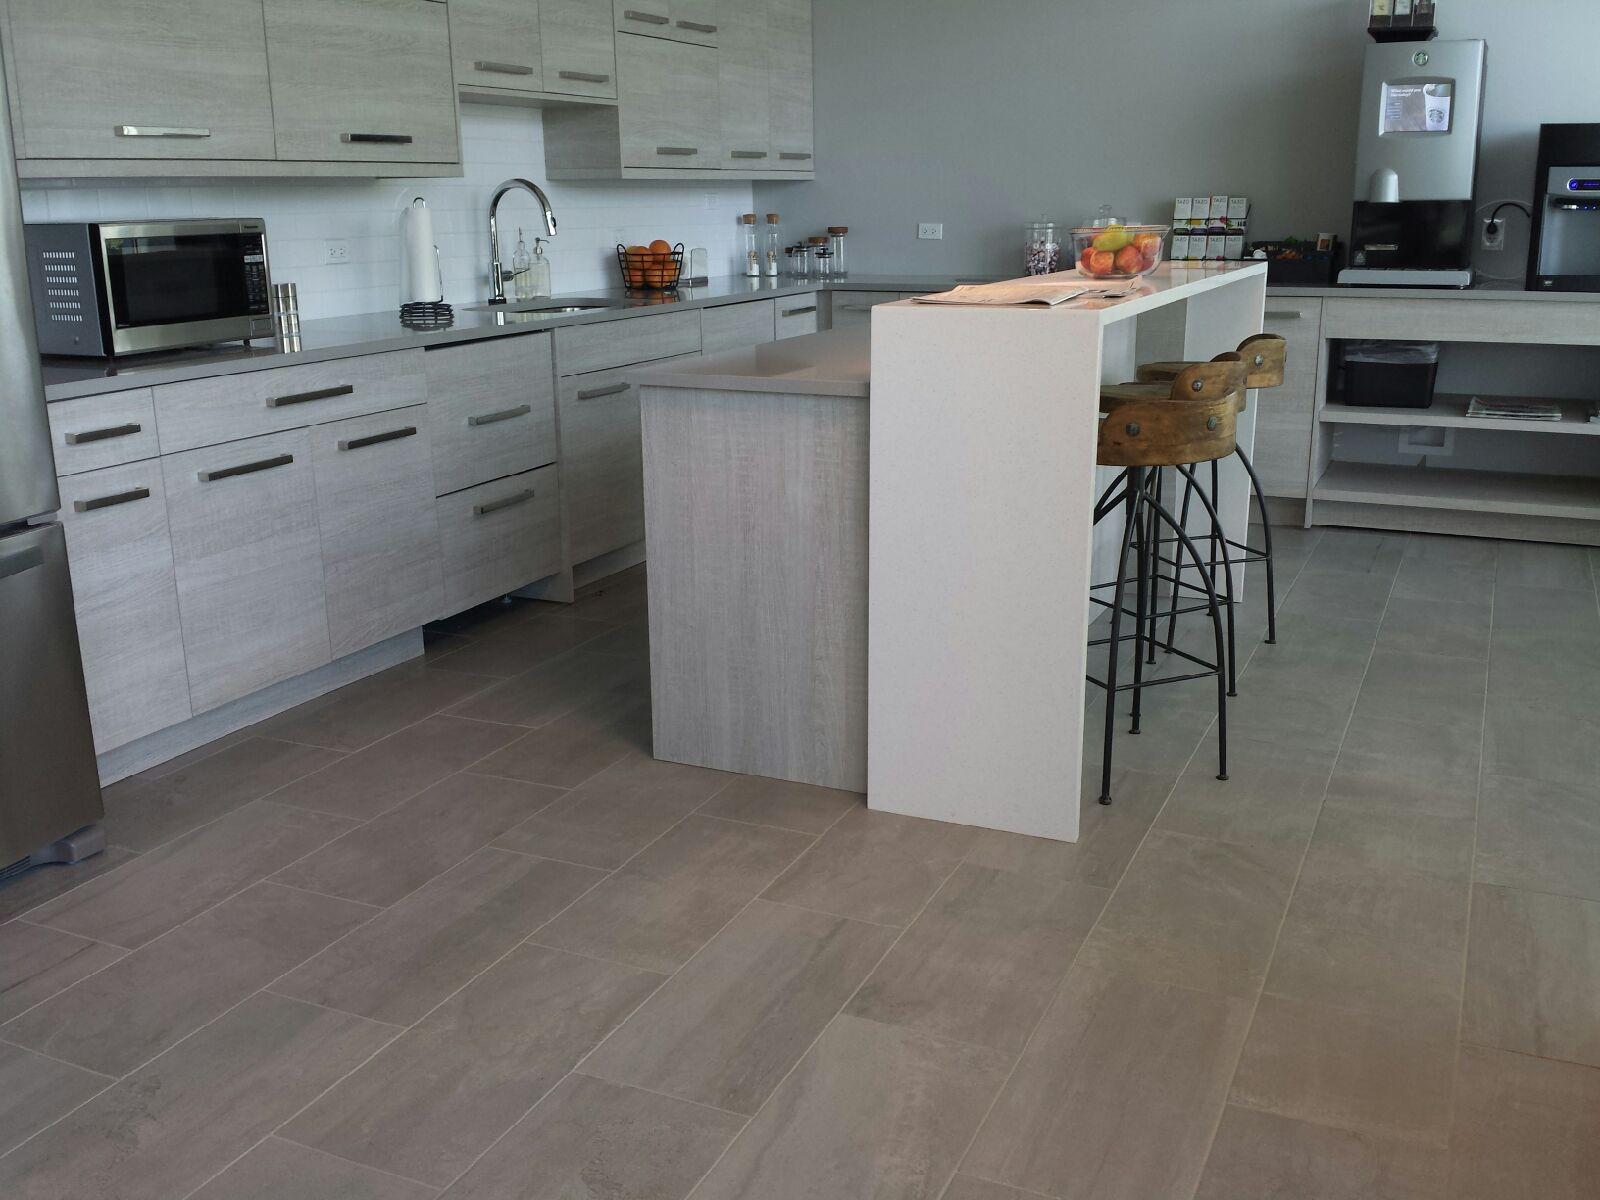 Ferentino Tile Design Inc image 5